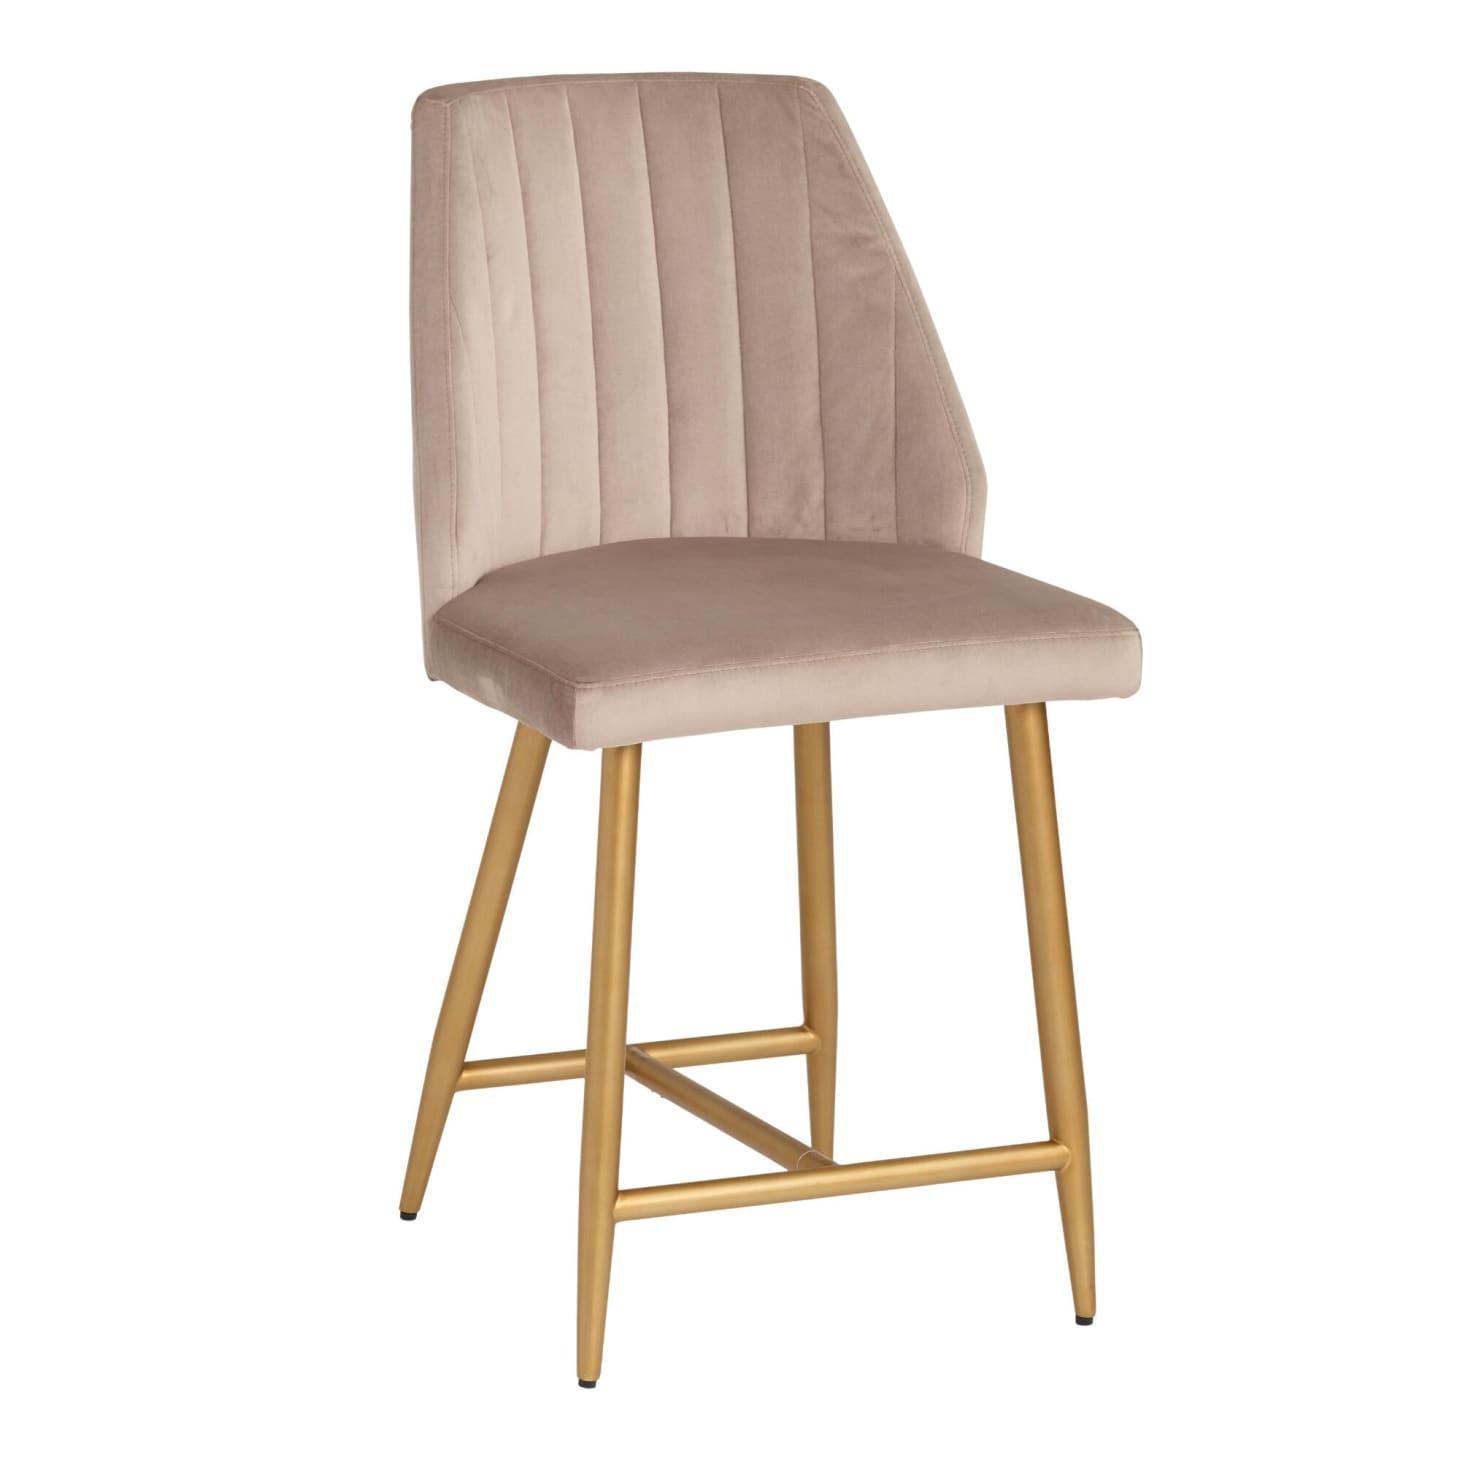 Enjoyable World Market Cyber Monday Deals 2019 Kitchn Inzonedesignstudio Interior Chair Design Inzonedesignstudiocom